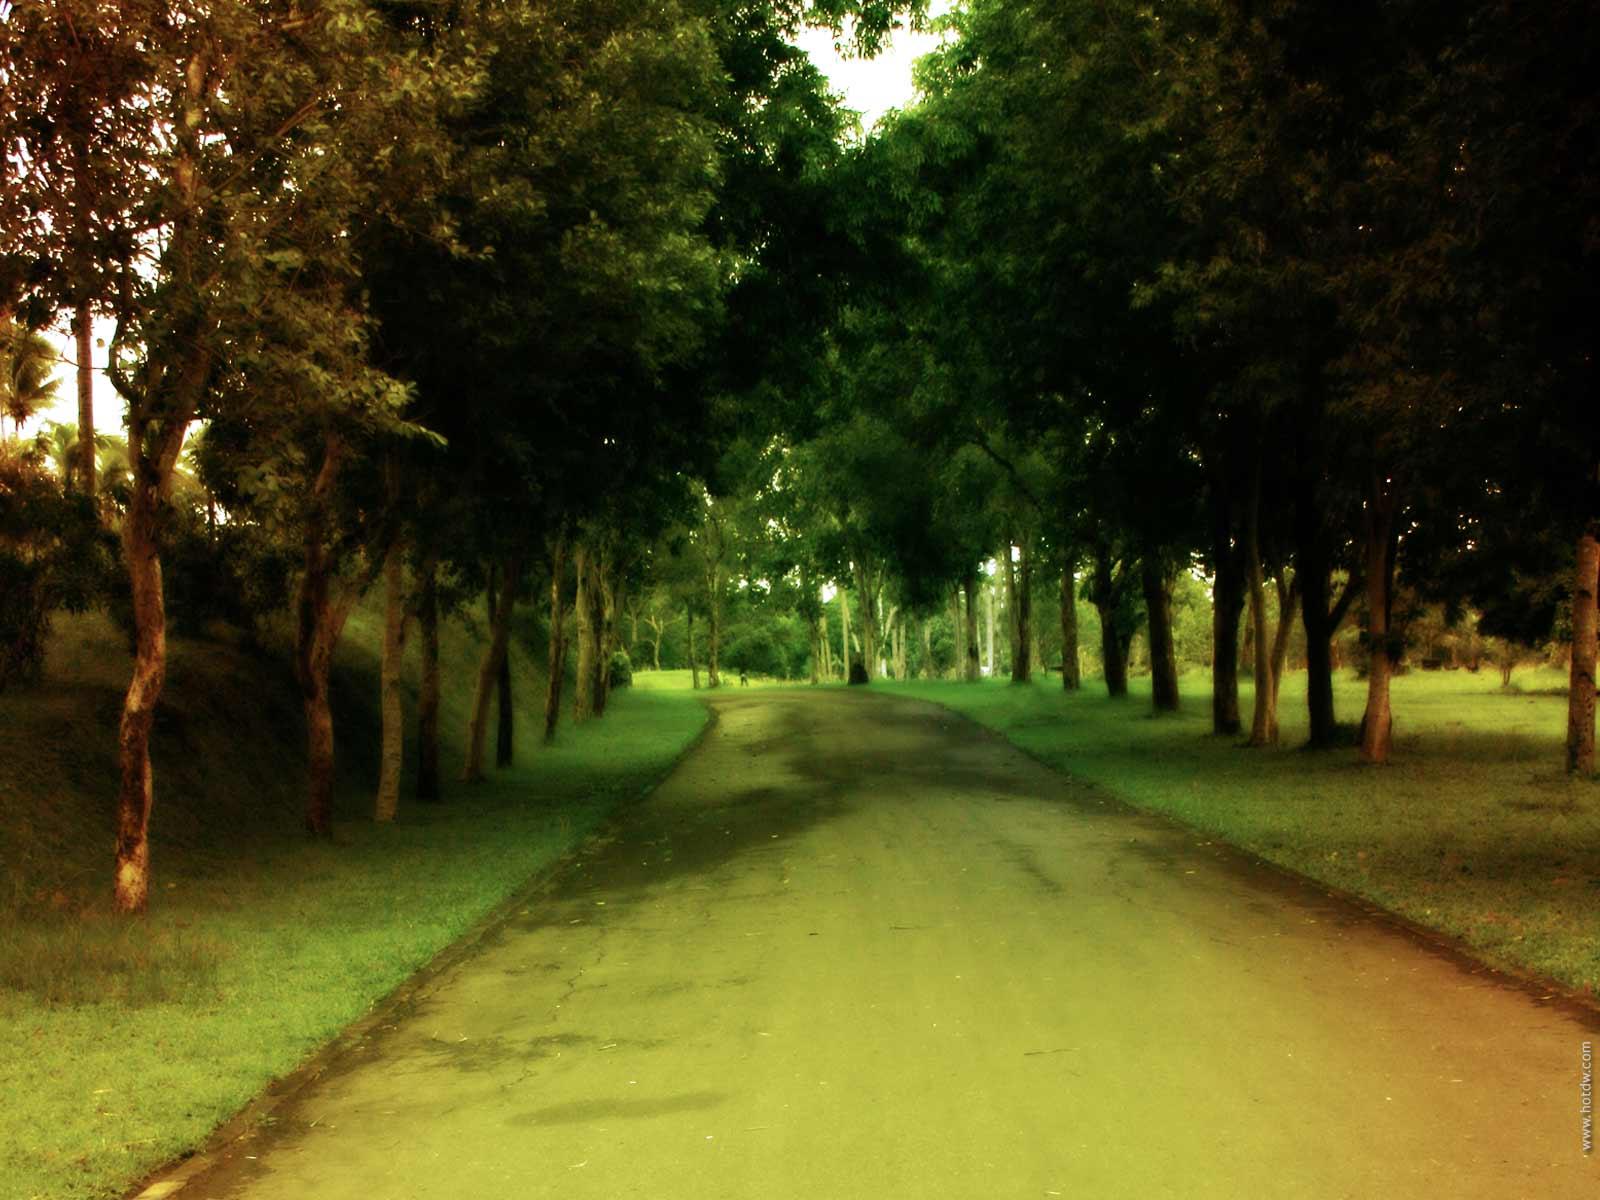 http://4.bp.blogspot.com/-RqZ0Zx3bwdU/Tn-ehnitbRI/AAAAAAAAARM/jpy00_ozR0s/s1600/green+color+wallpaper+2.jpg